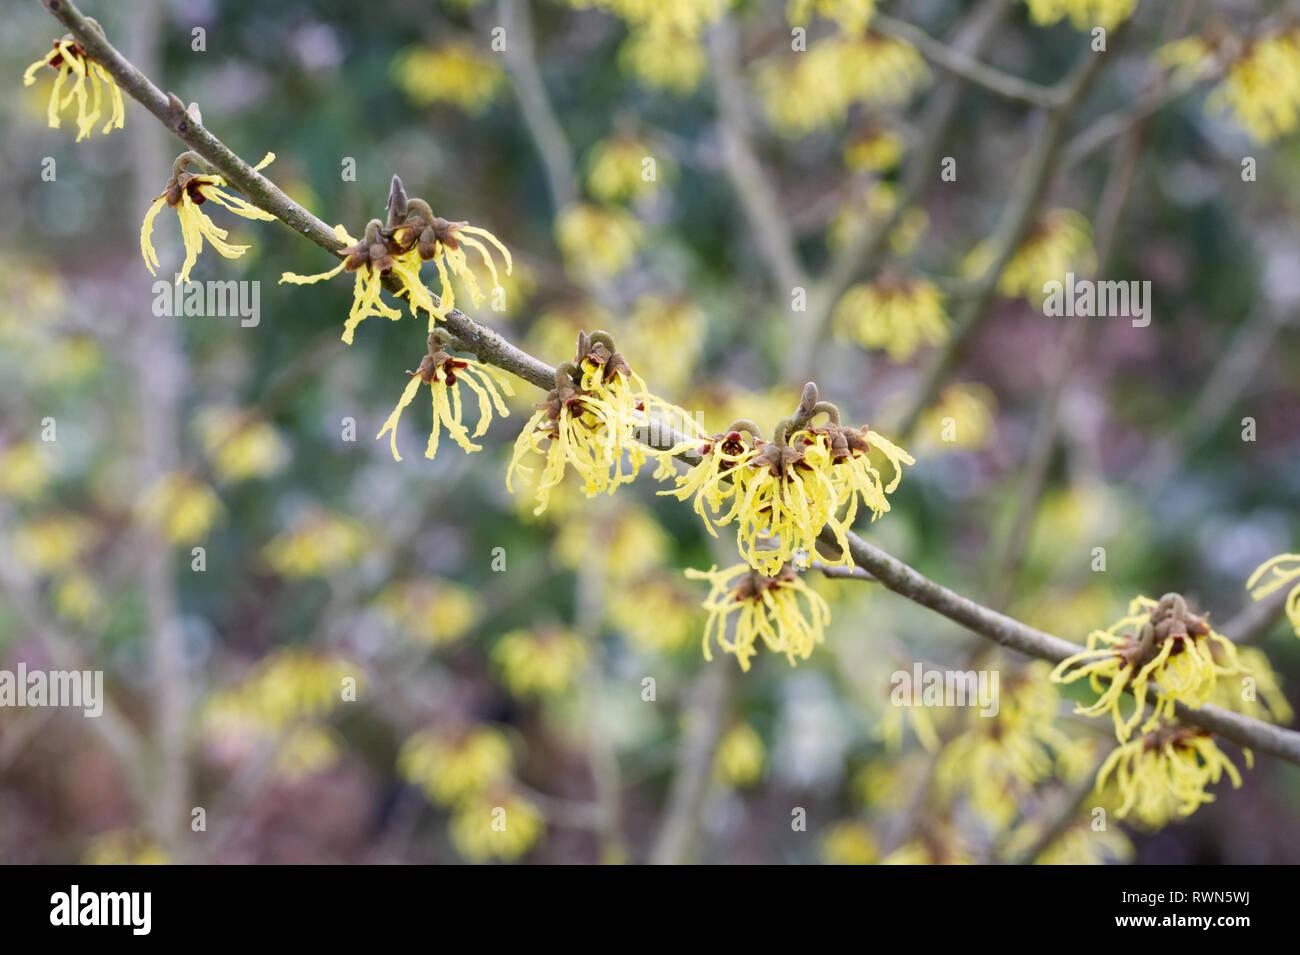 Etwas Neues genug Hamamelis Baum Winter Stockfotos & Hamamelis Baum Winter Bilder &WO_13